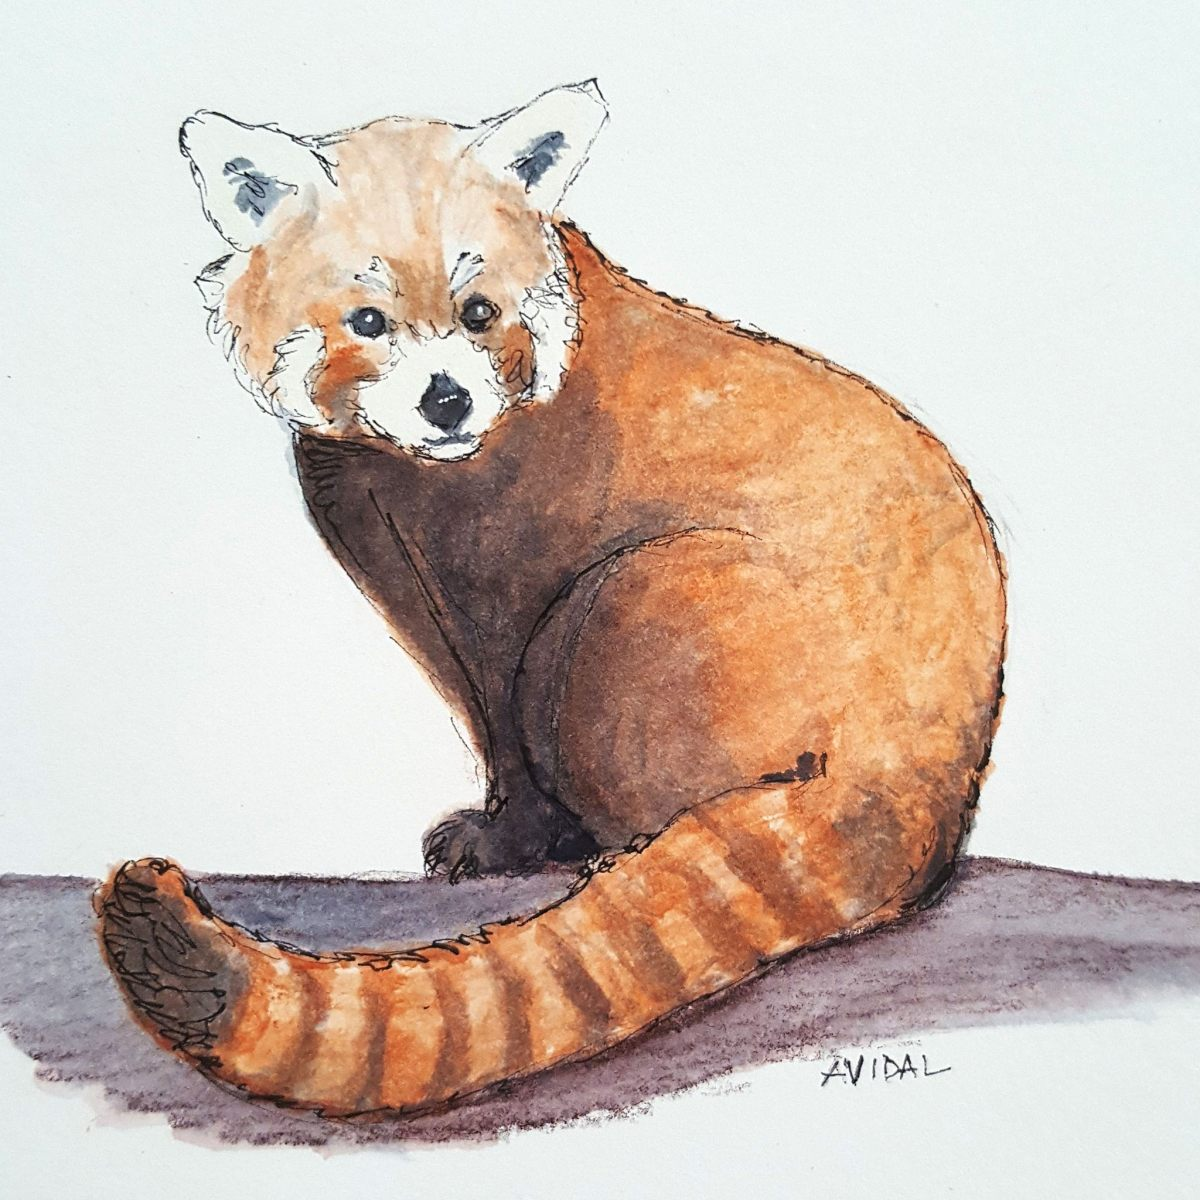 #WorldWatercolorGroup - Watercolor - Red Panda by Adriana Vidal - #doodlewash